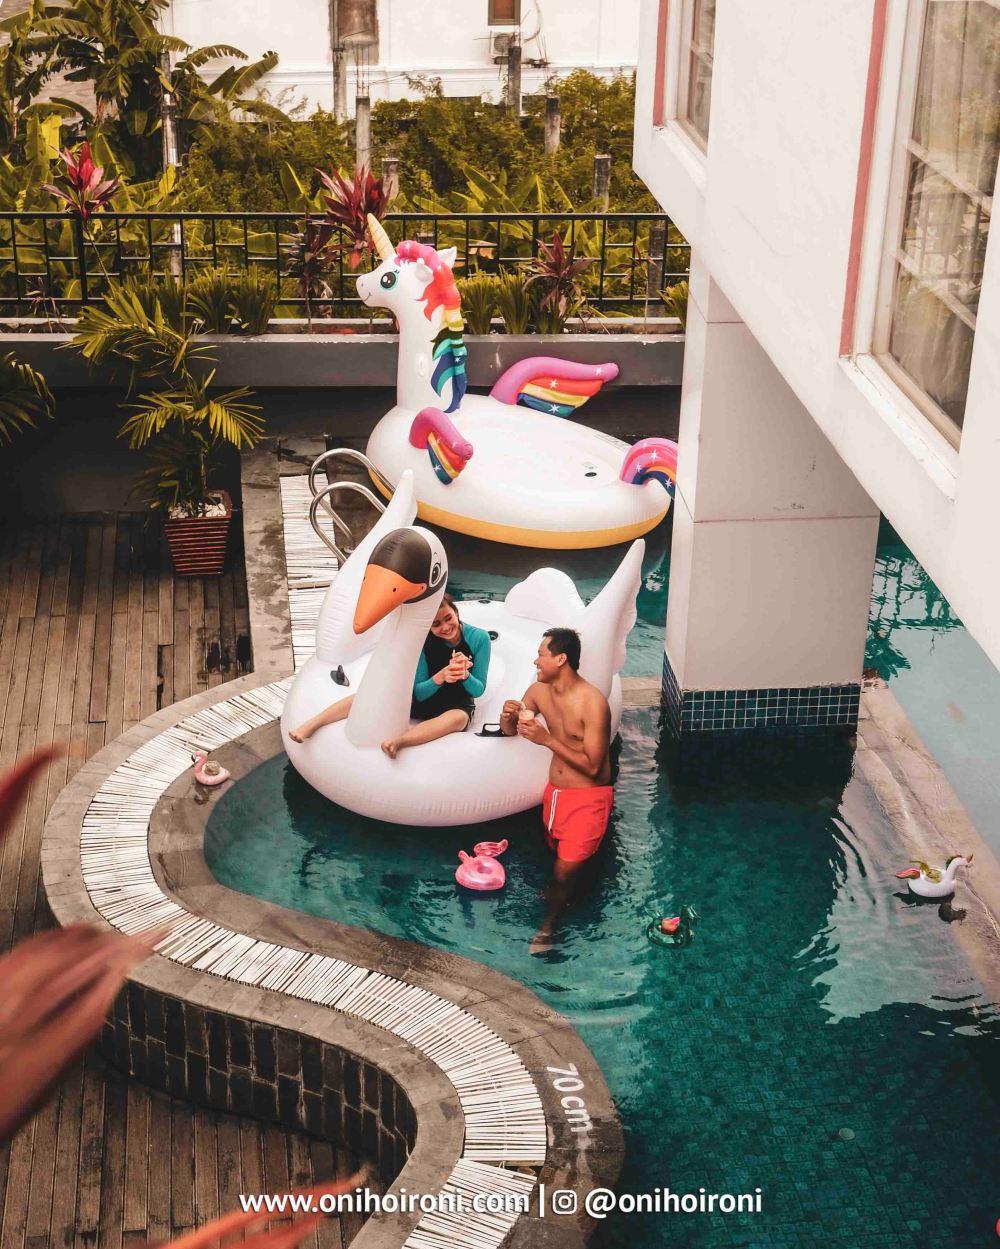 2 Swimming Pool Fave Hotel palembang Oni Hoironi